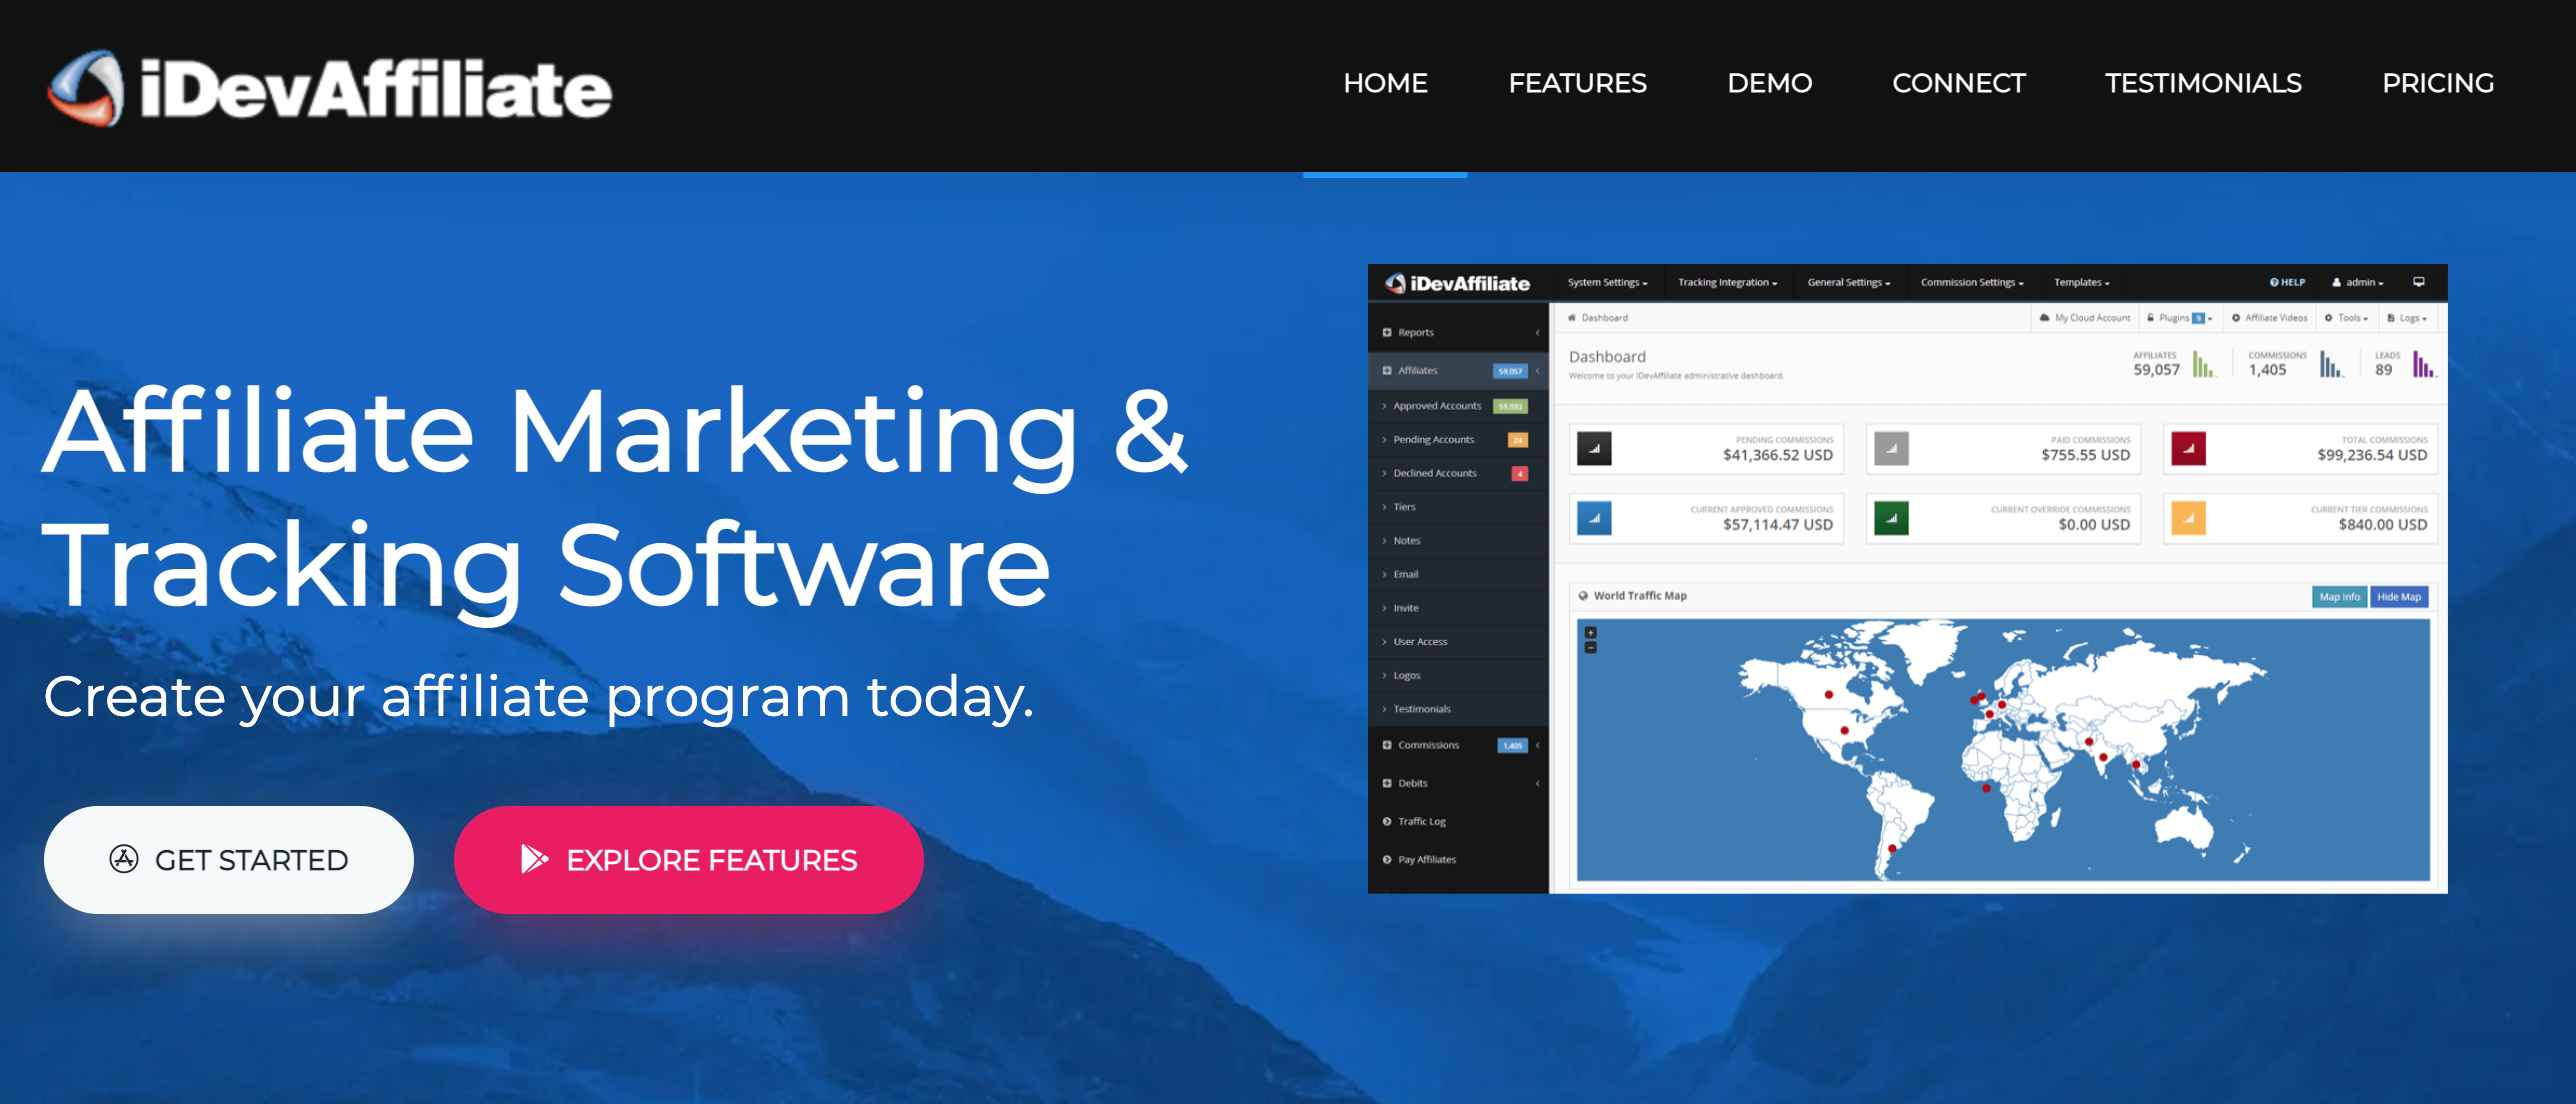 Marketing Software: iDevAffiliate